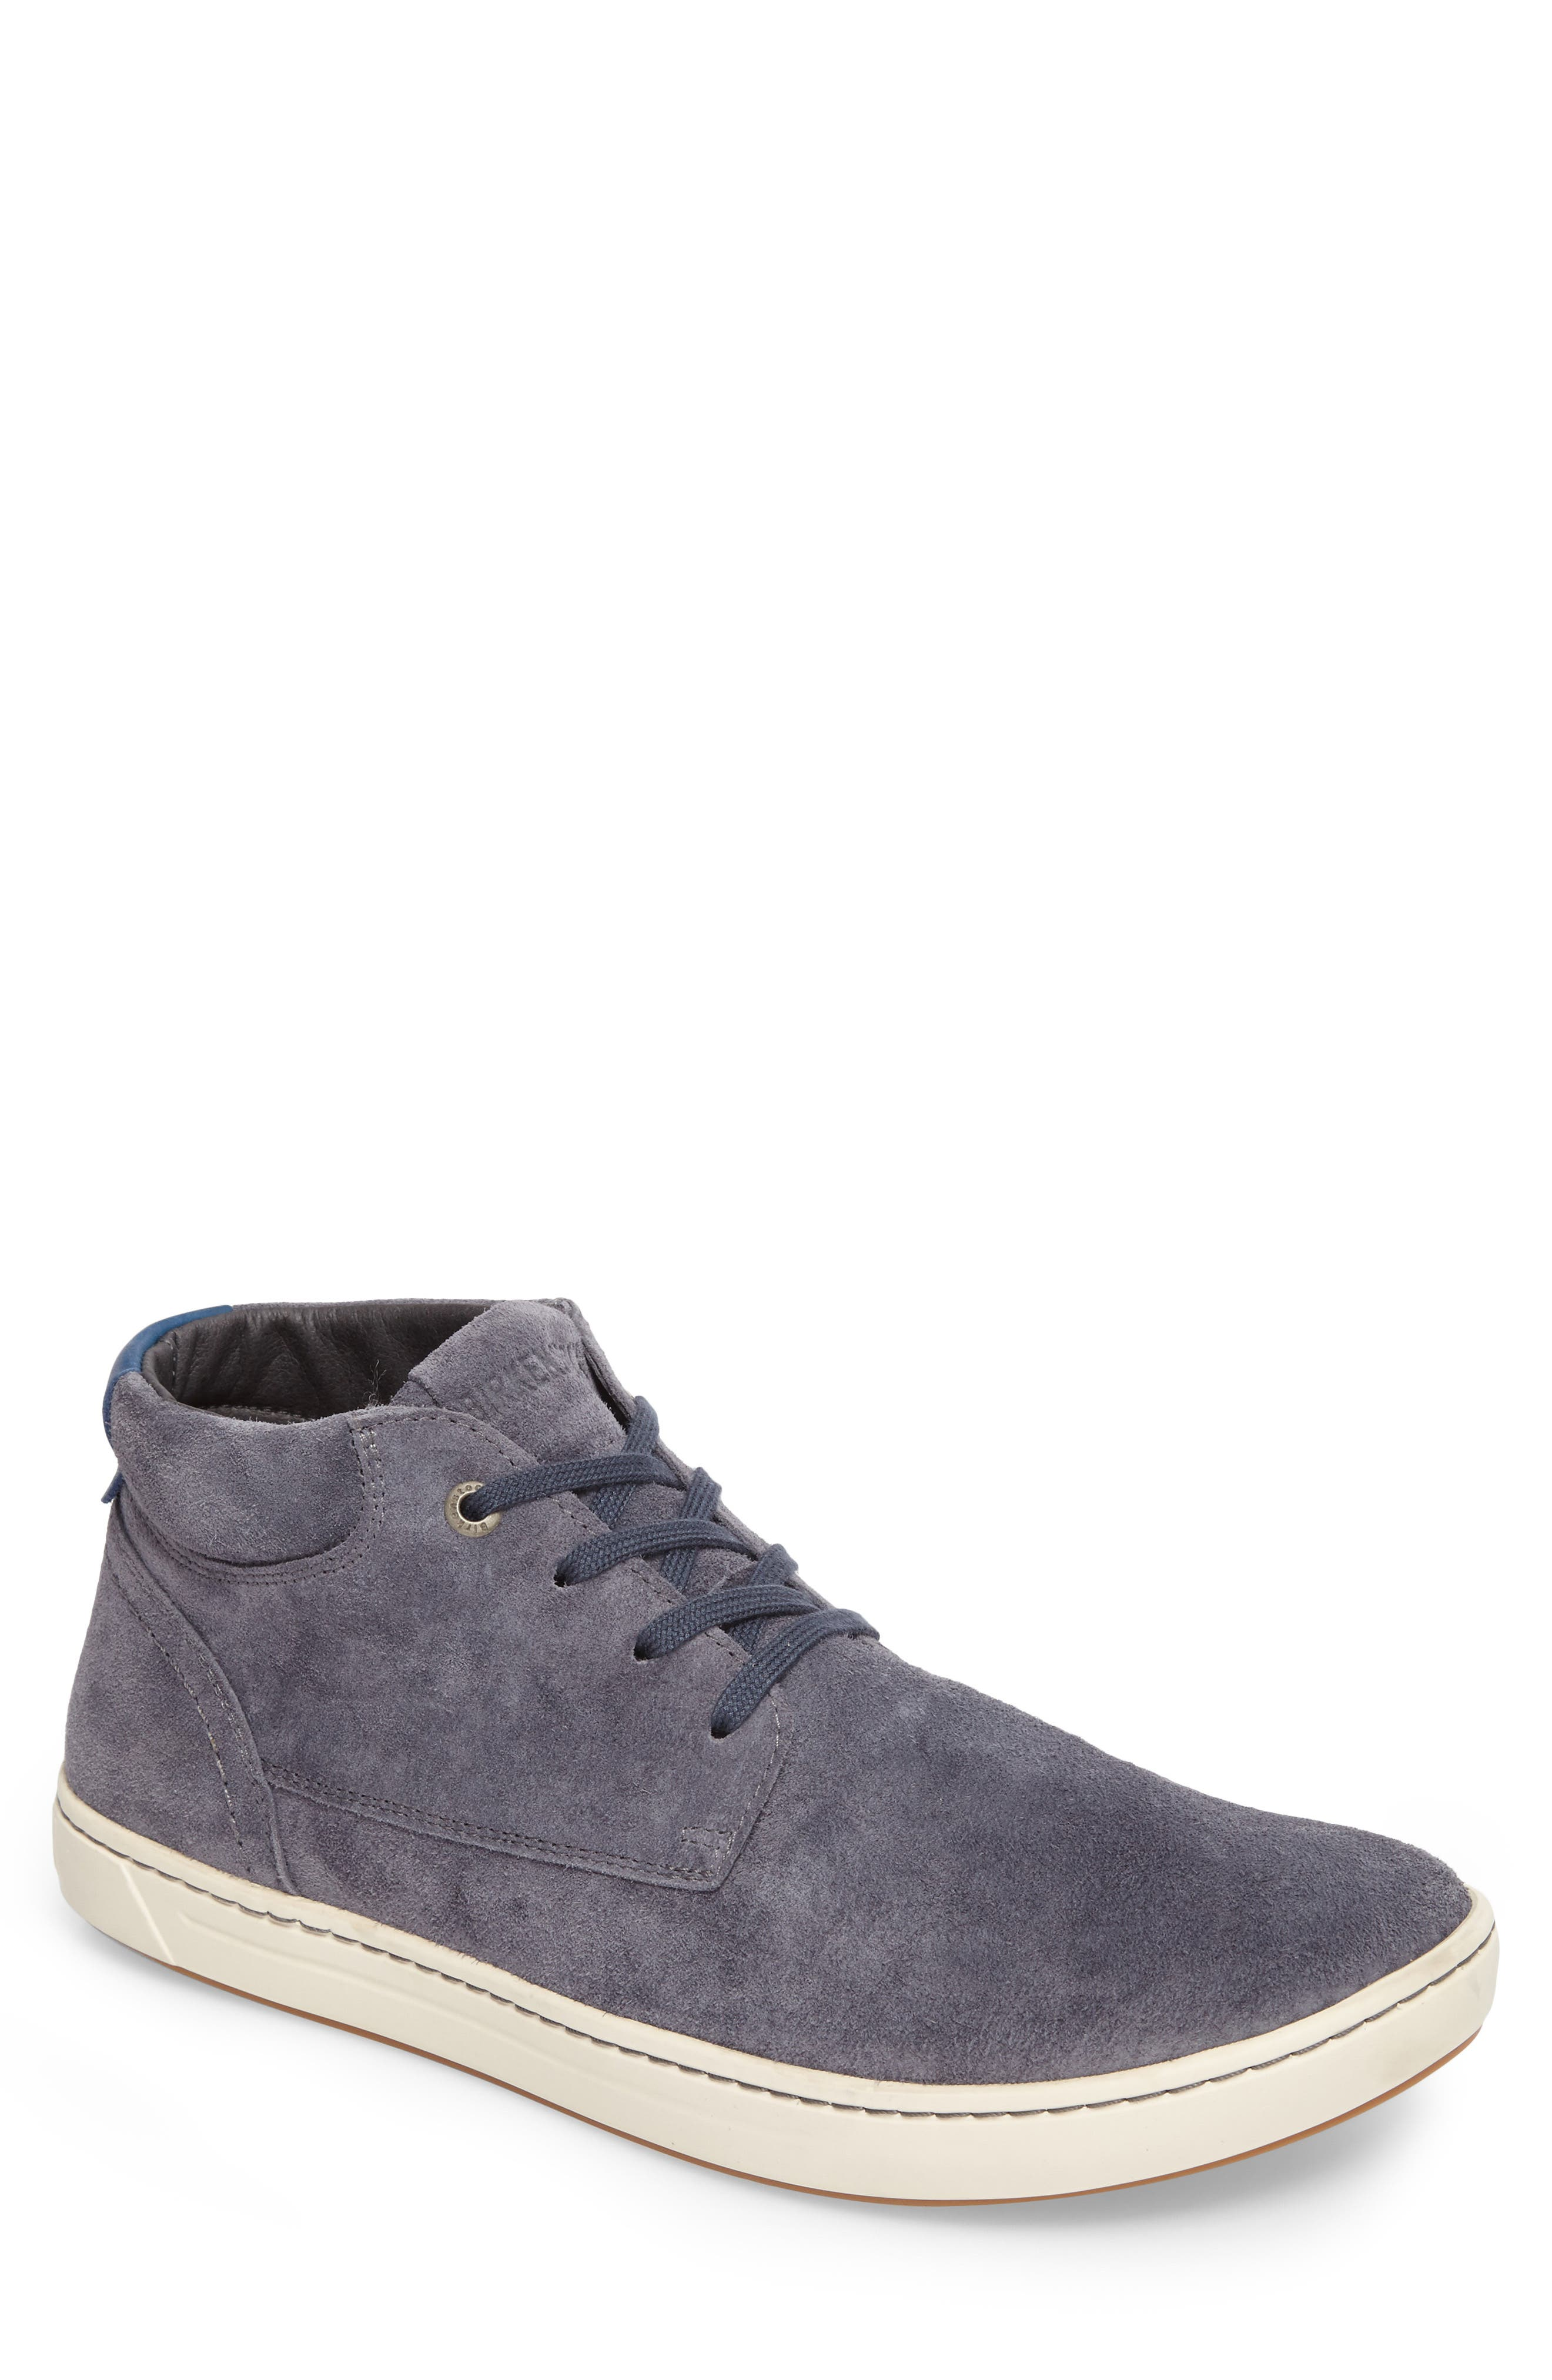 Alternate Image 1 Selected - Birkenstock Brandon Sneaker (Men)